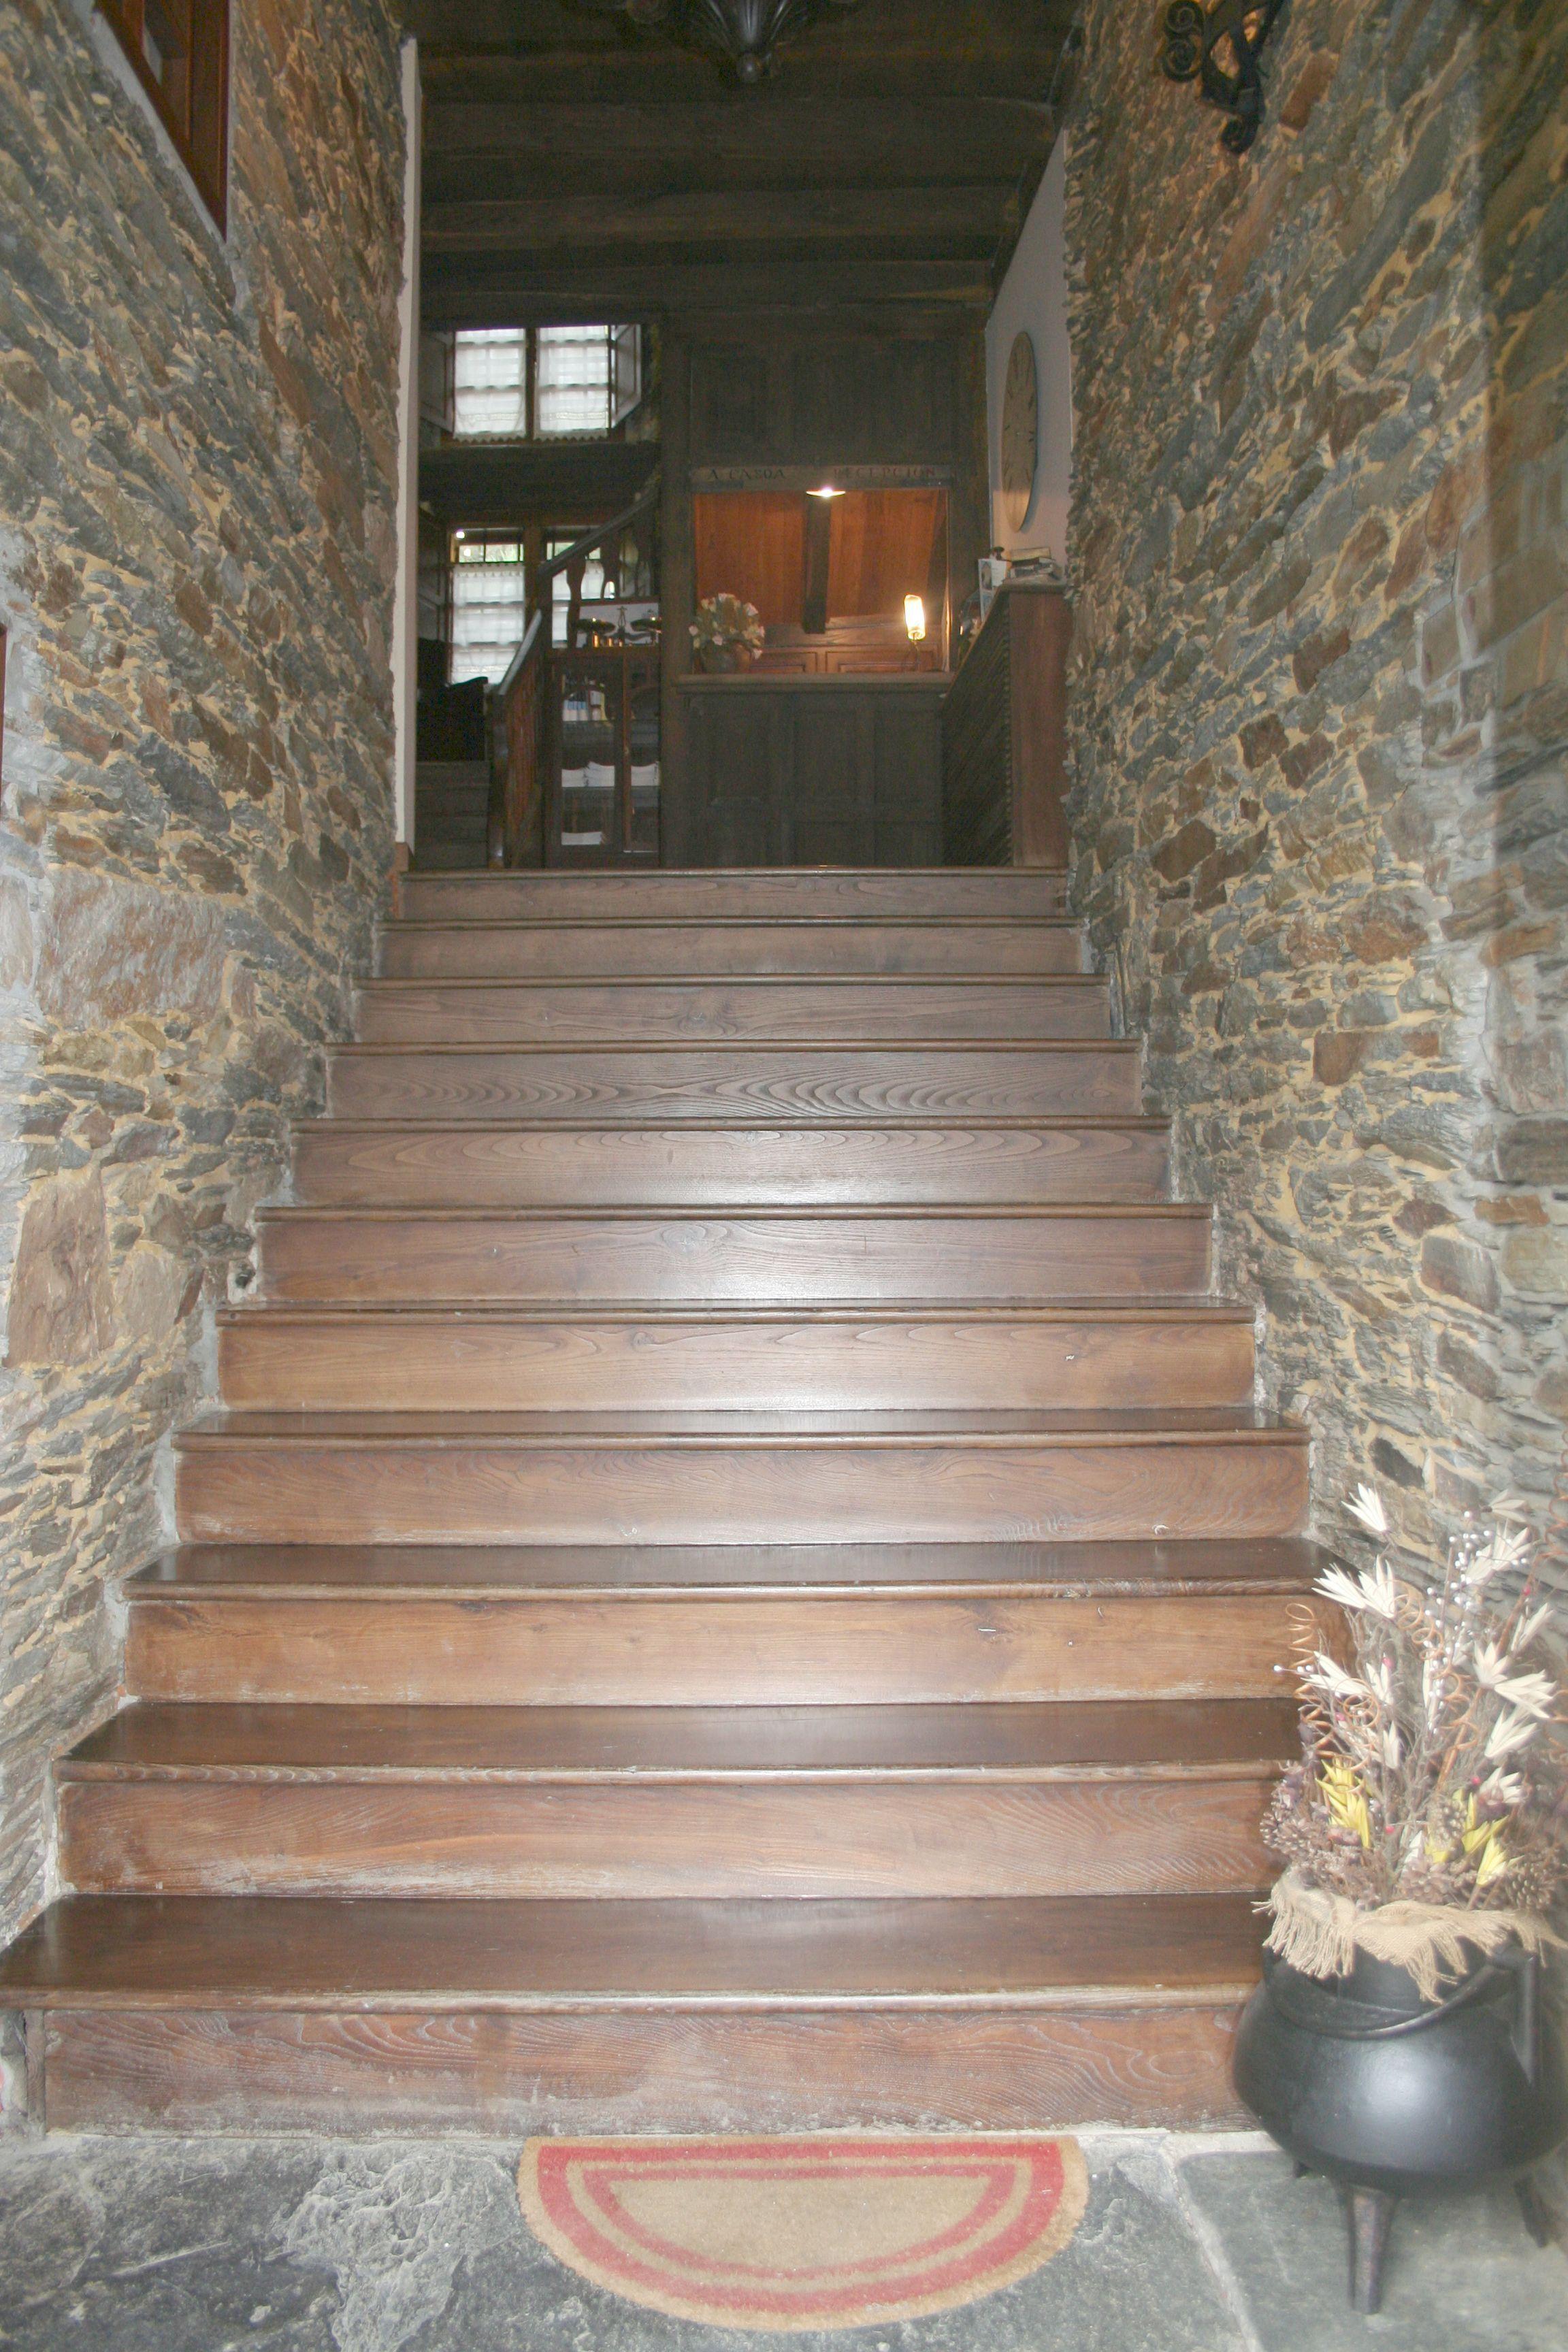 escalera entrada www.acasoa.com (escalera original realizada con tableros enteros de madera de castaño)